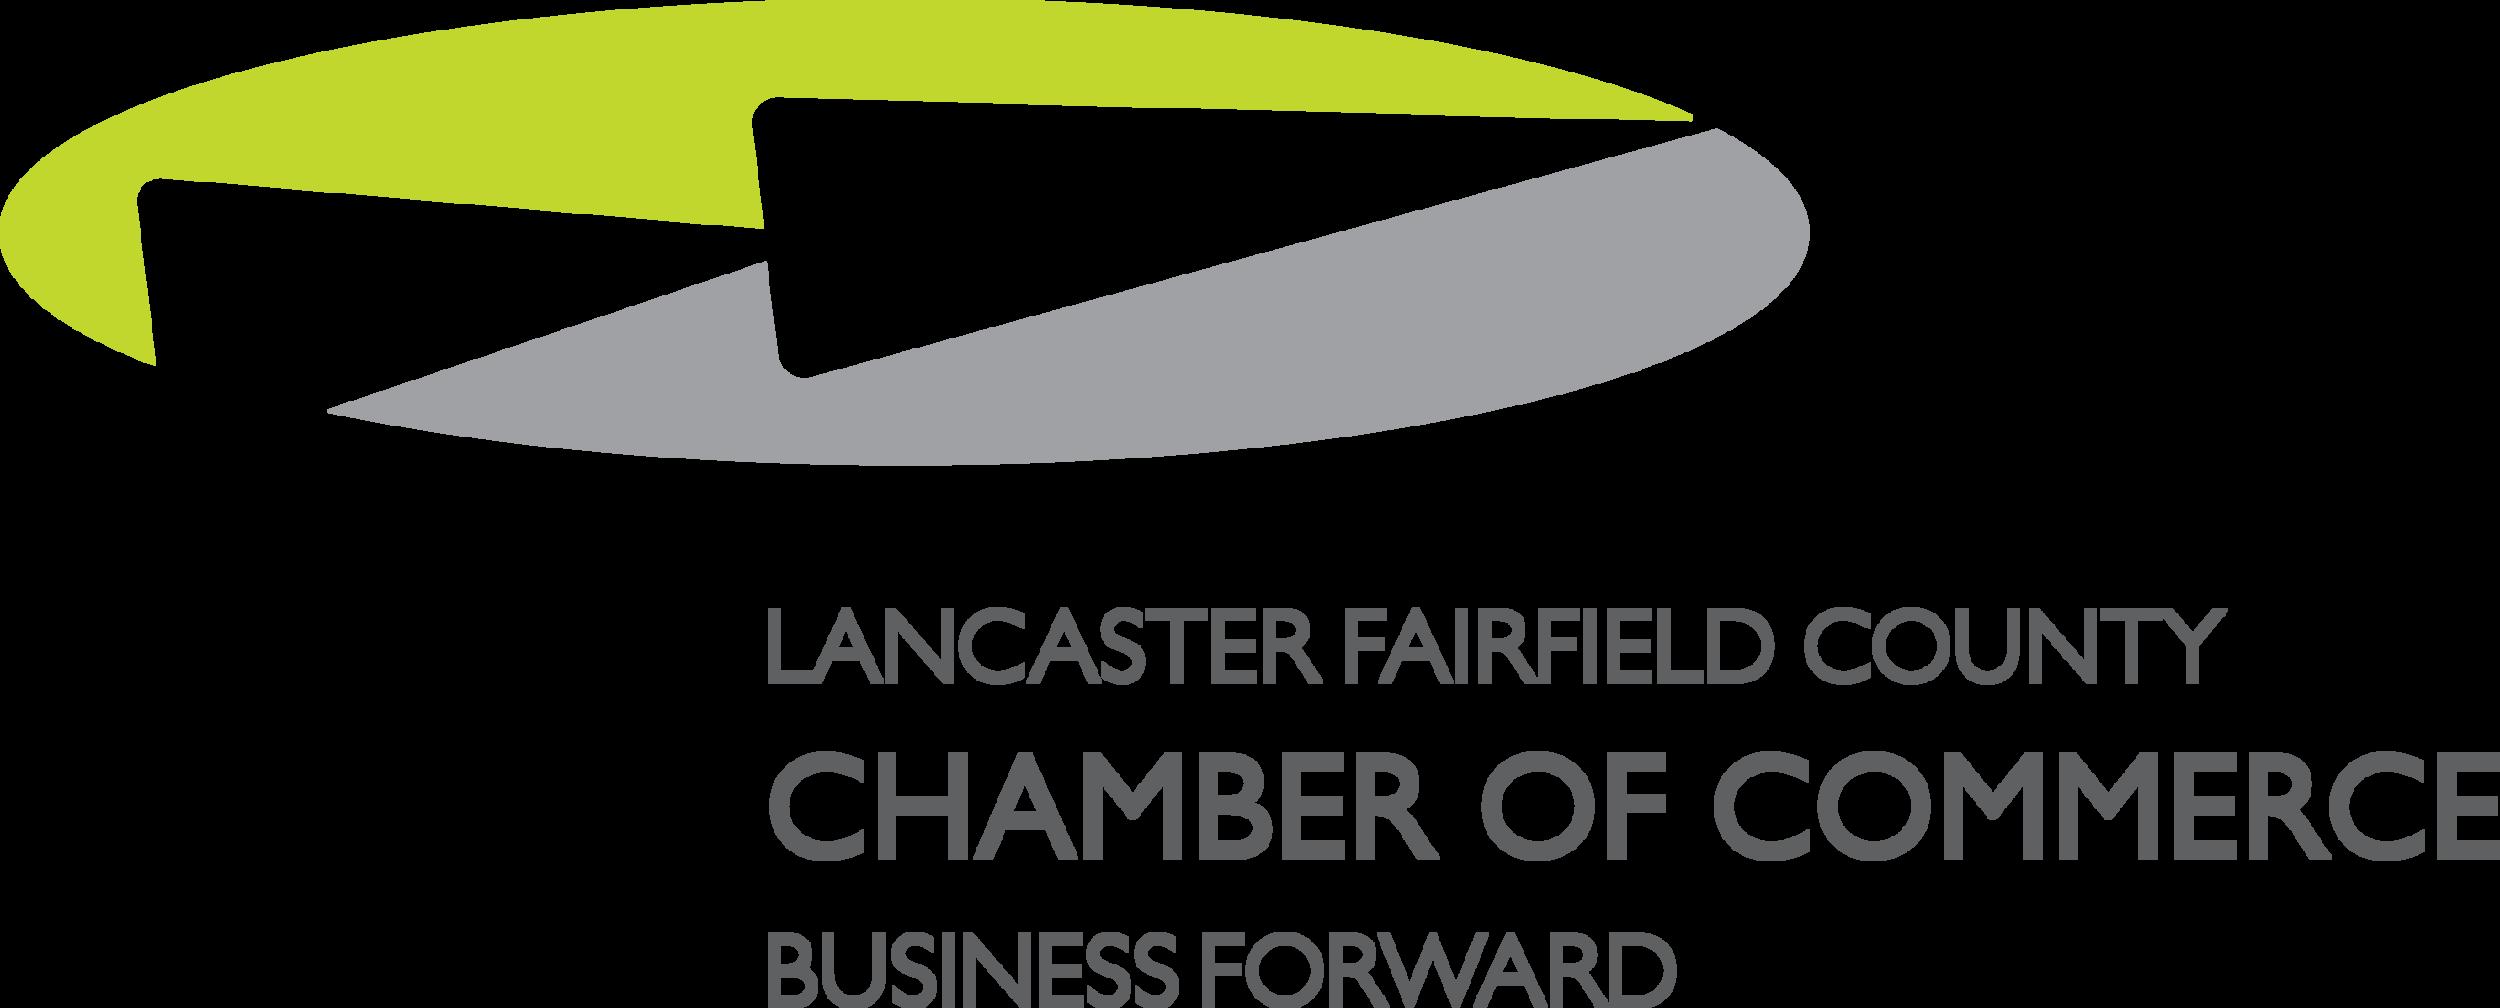 chamber_BF_logo.png